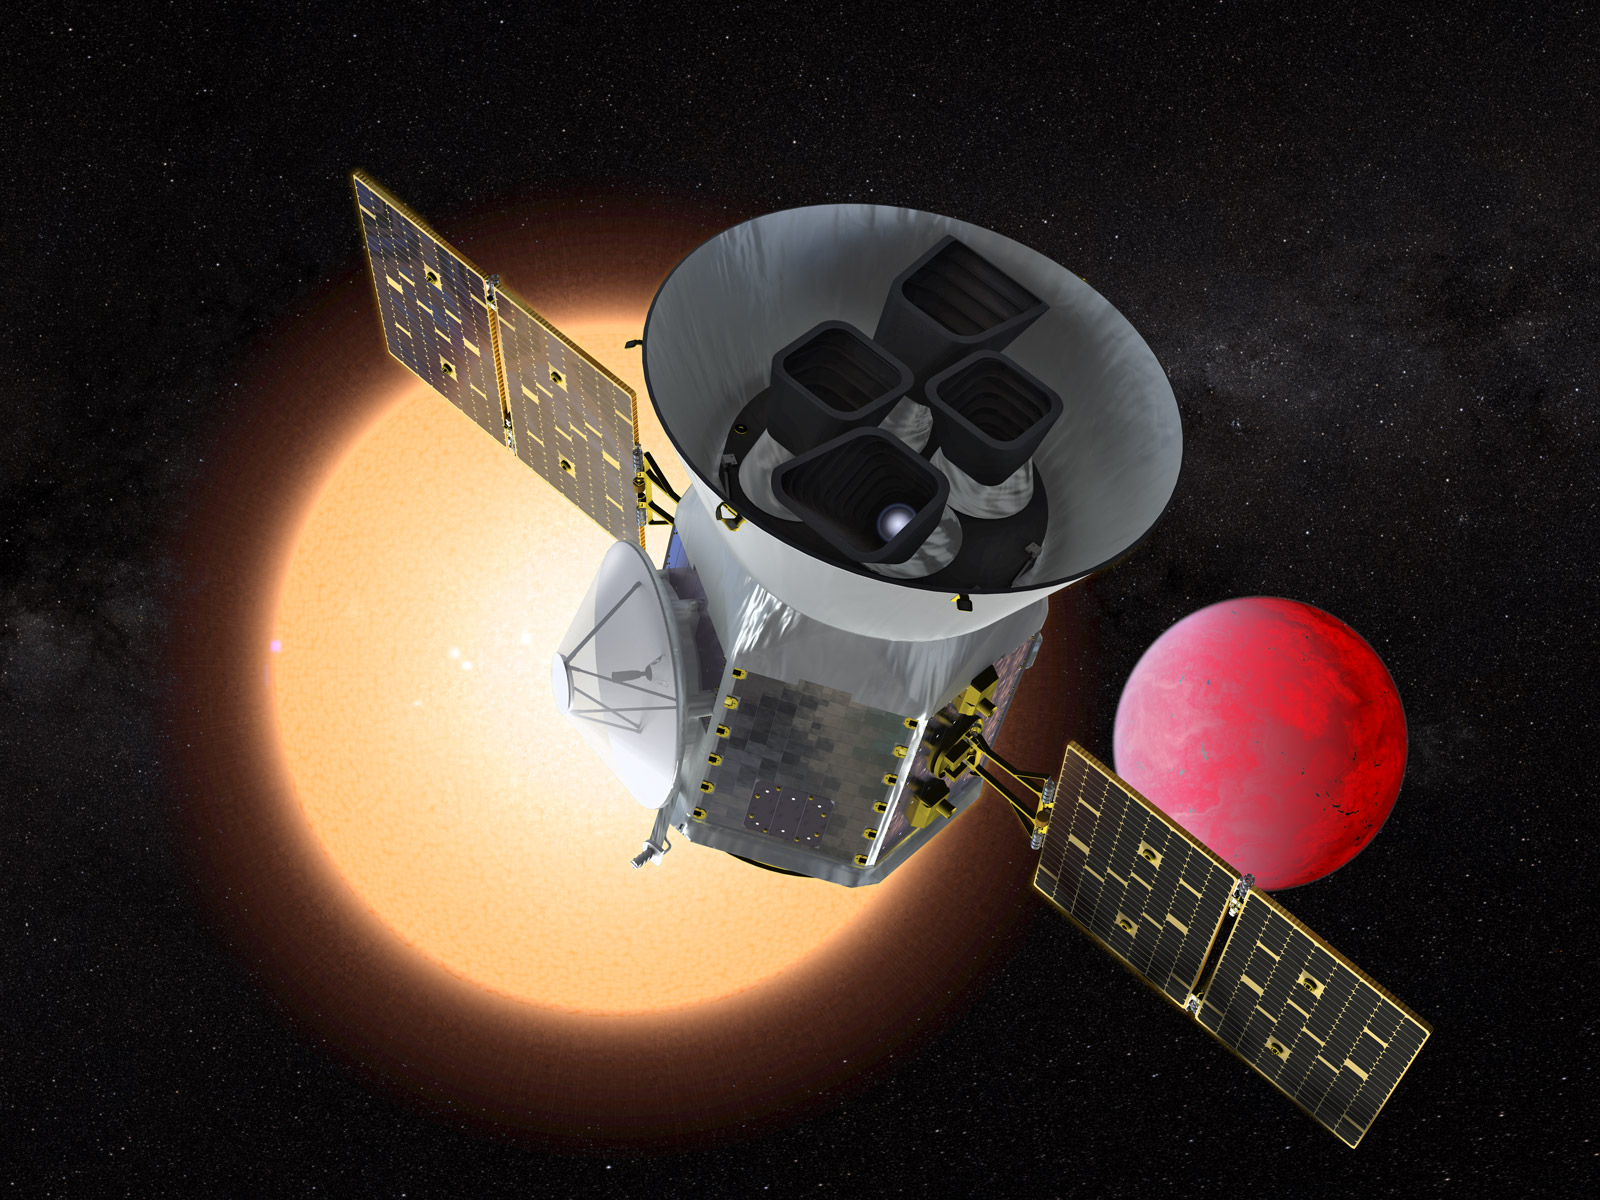 NASA's New Planet Hunter Just Found Its 1st Alien World — an